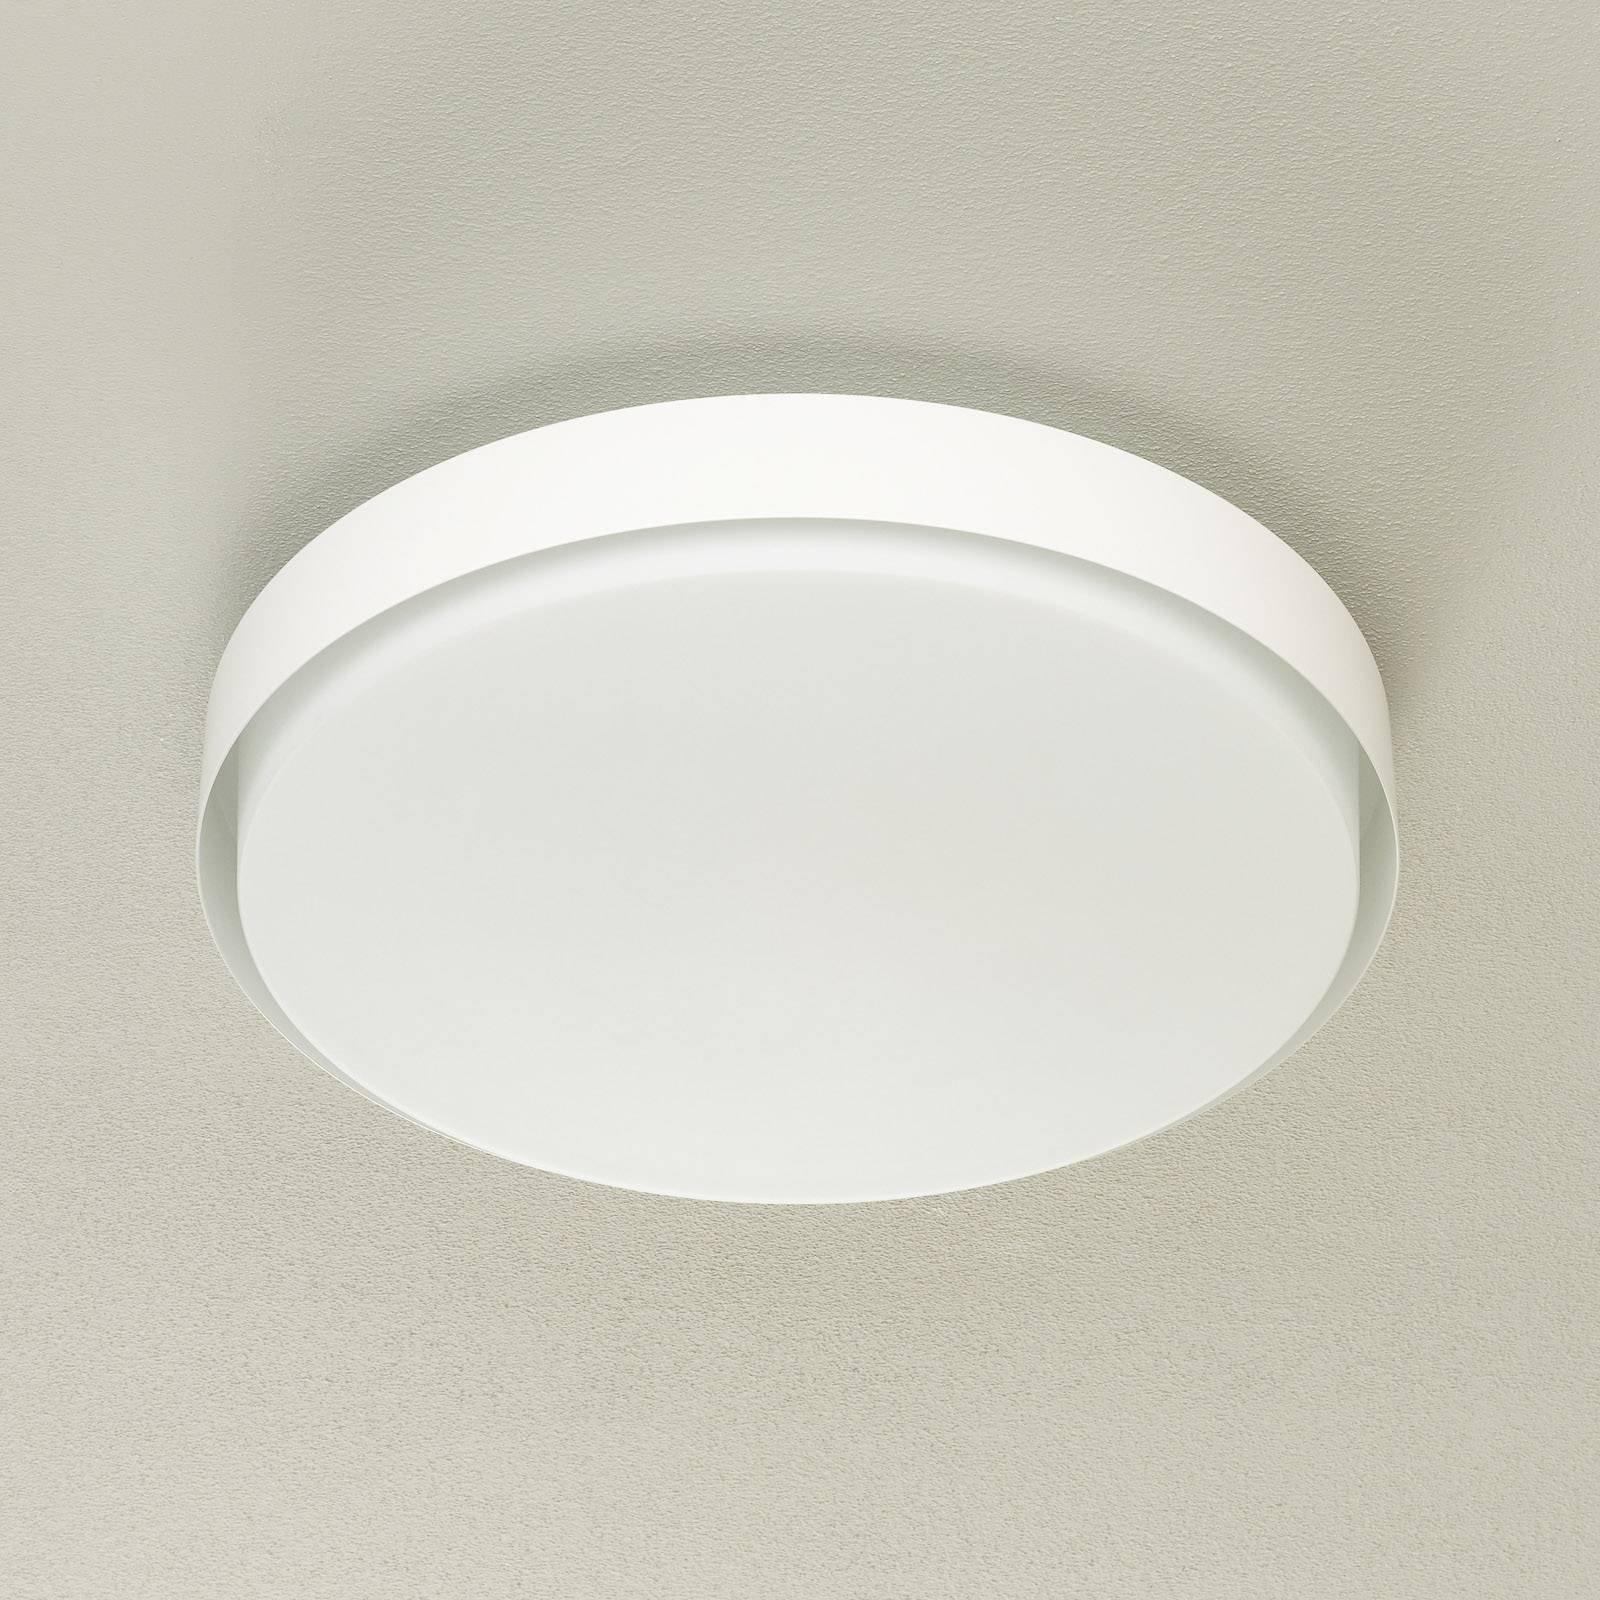 BEGA 12165 LED-taklampe hvit, Ø 50 cm, DALI